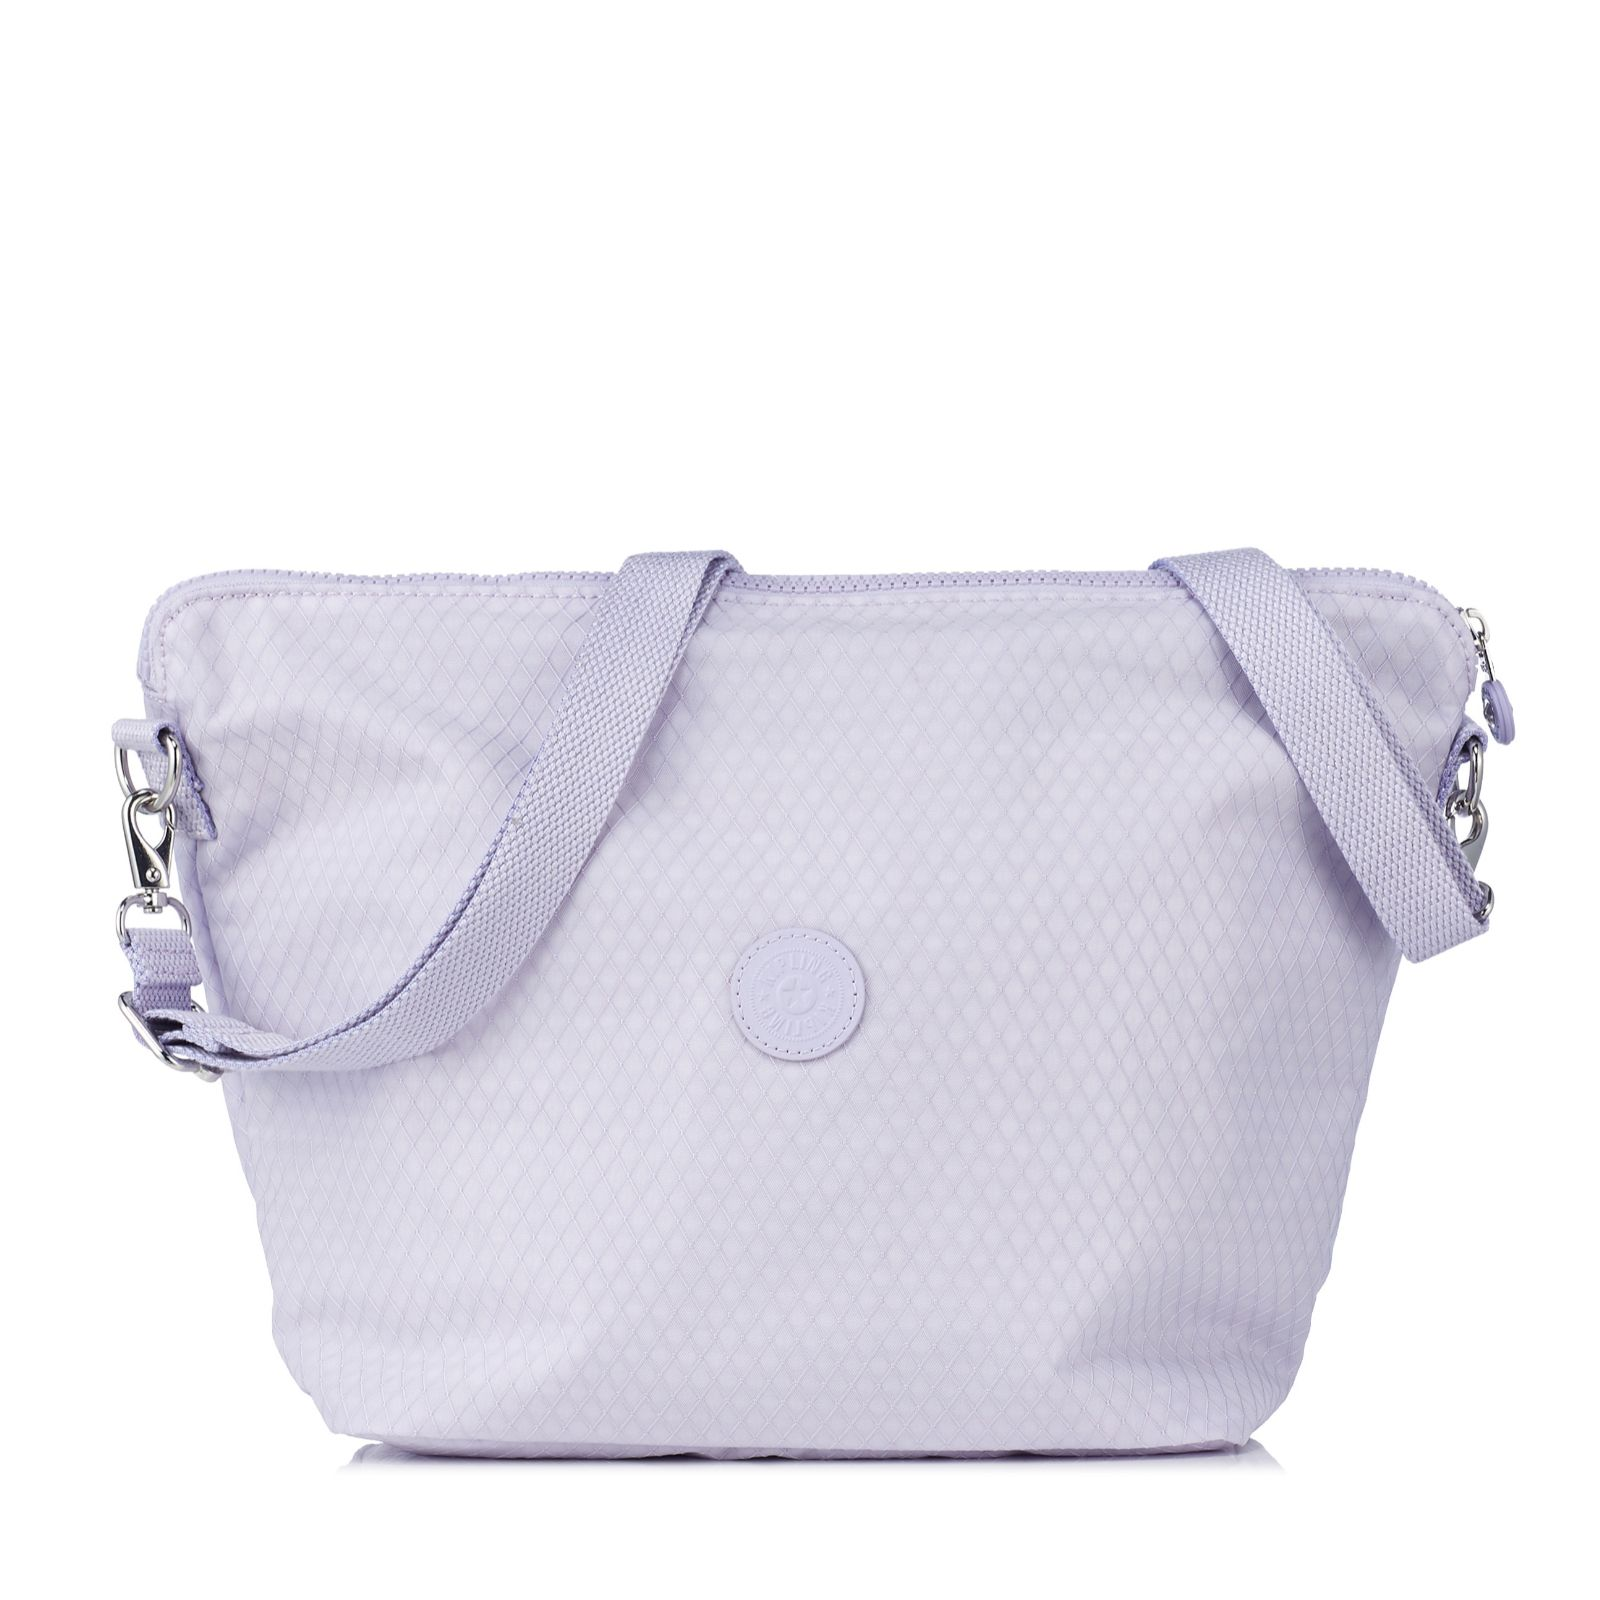 Kipling Audria Premium Large 2 in 1 Tote Bag with Shoulder Strap - QVC UK 534771157fdf0